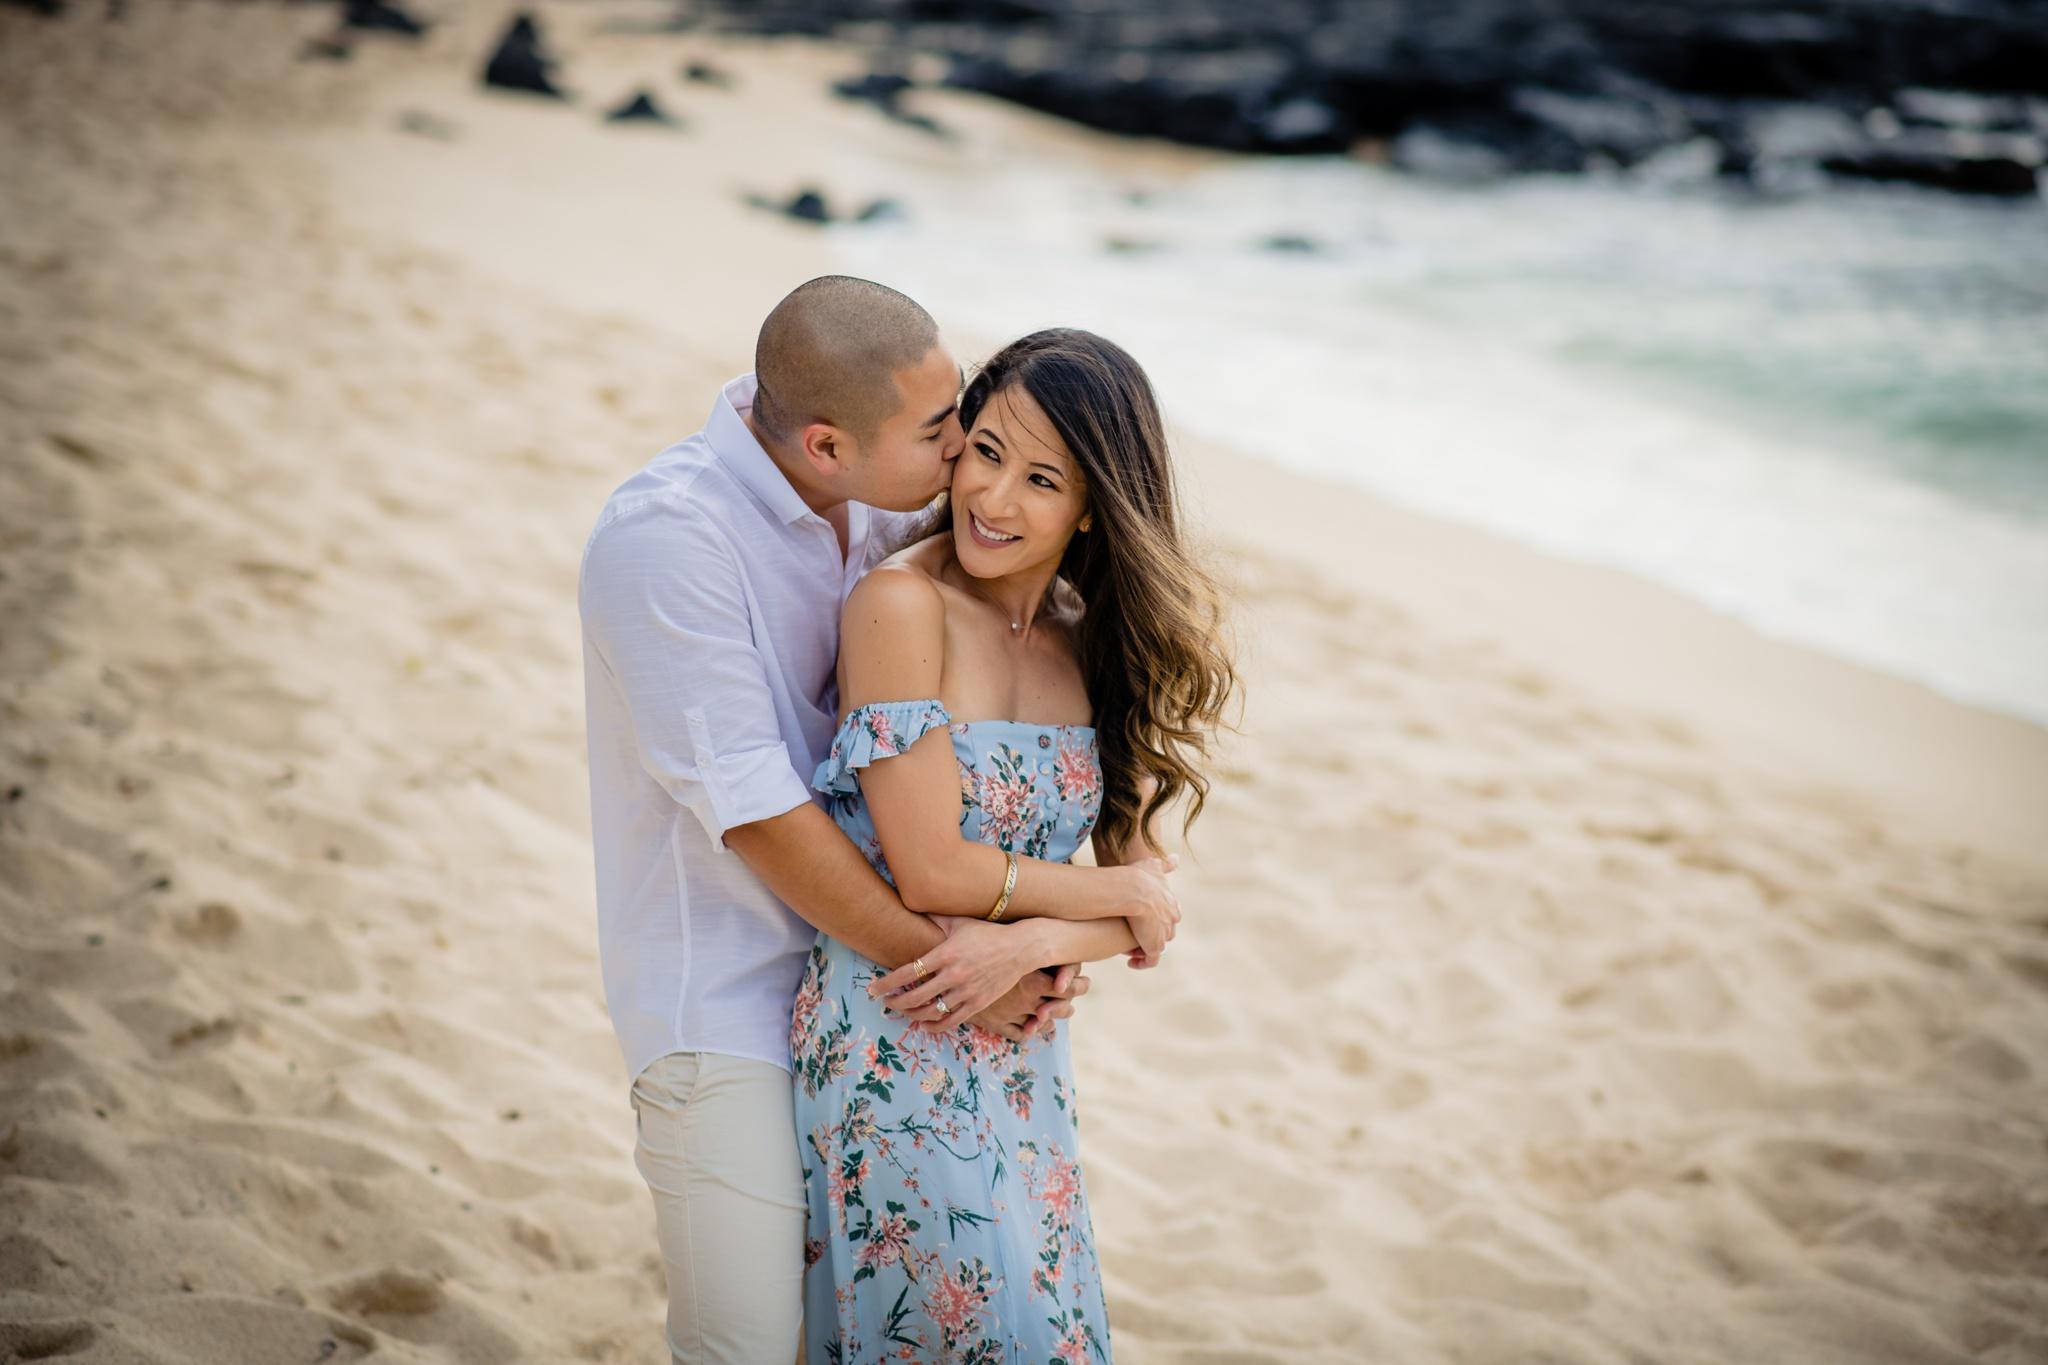 guy kissing his fiancee